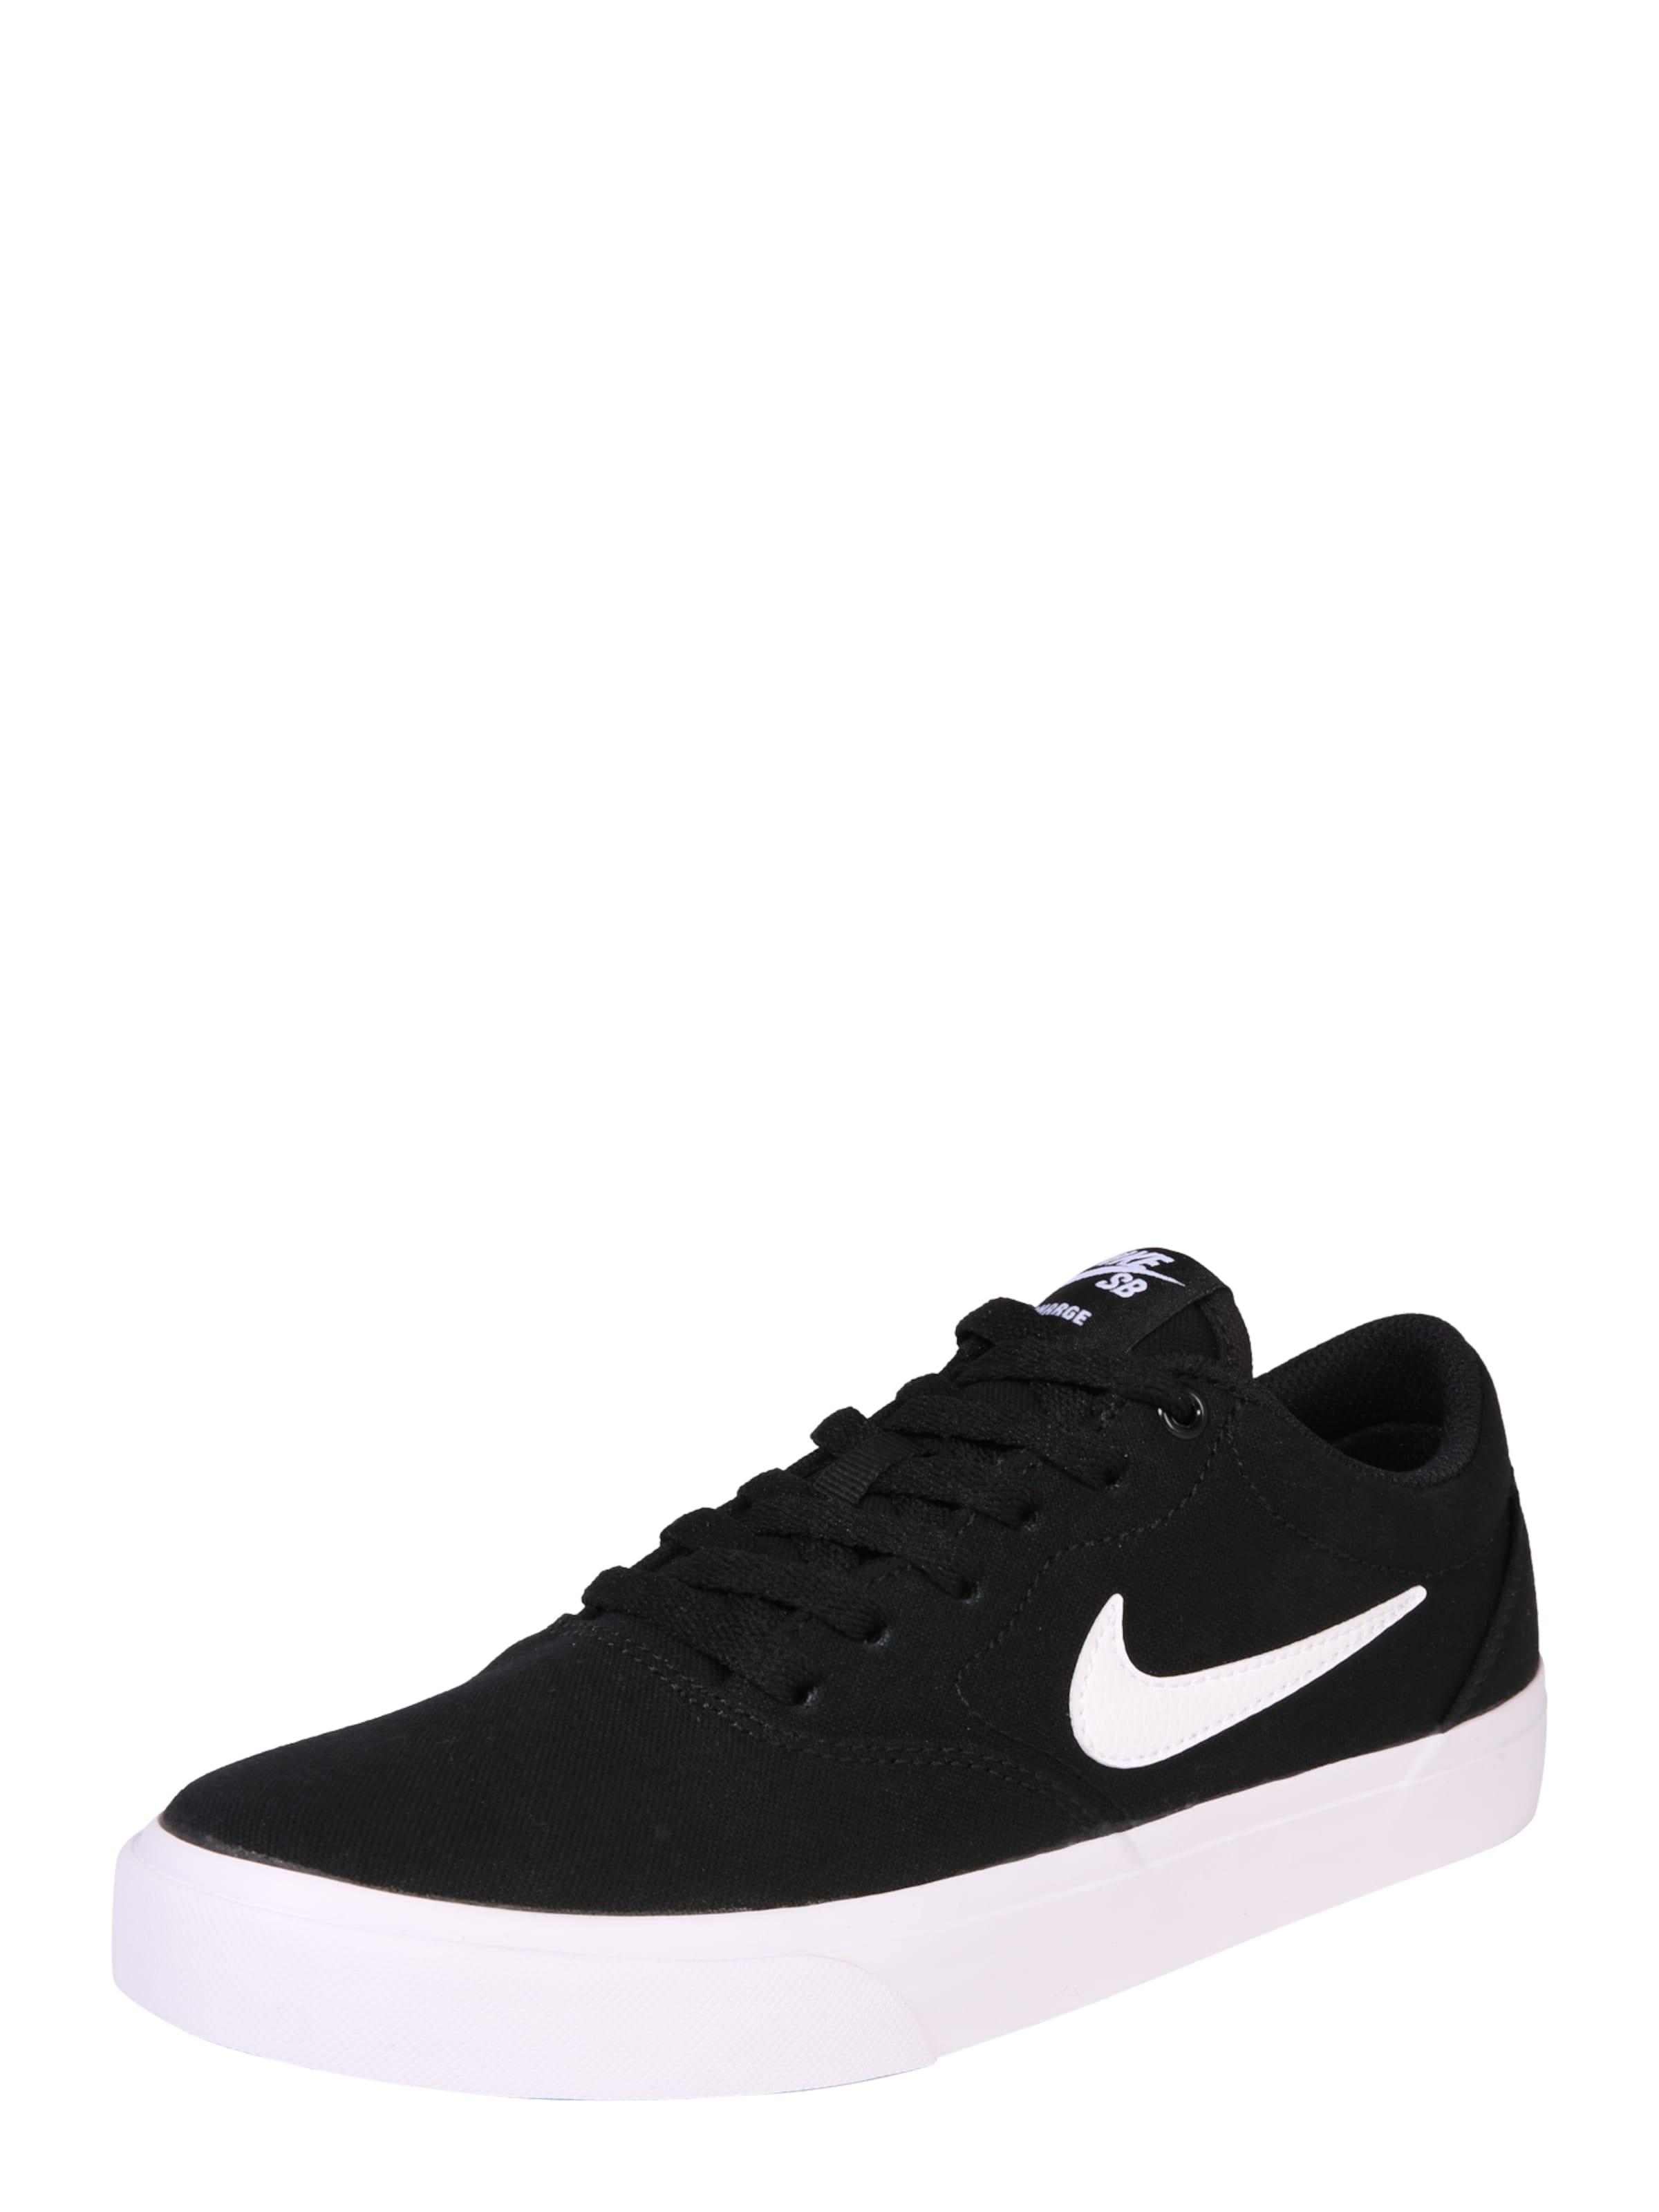 Sb Nike Charge Slr' En Baskets NoirBlanc 'nike Basses srxthCQd